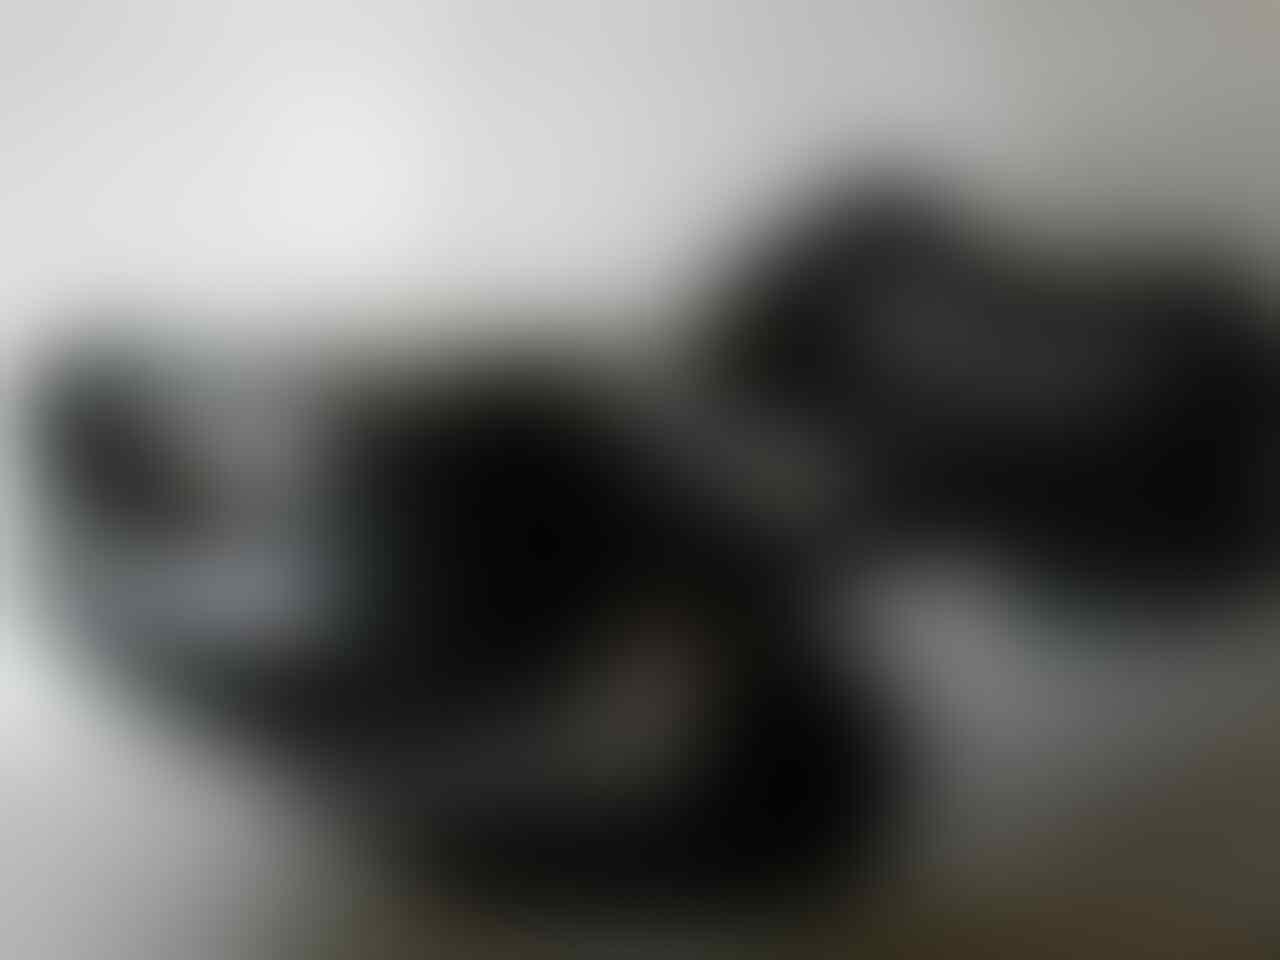 jaket alpha industries seri mcgyver sze medium tractop adidas vintag dn brougues quil